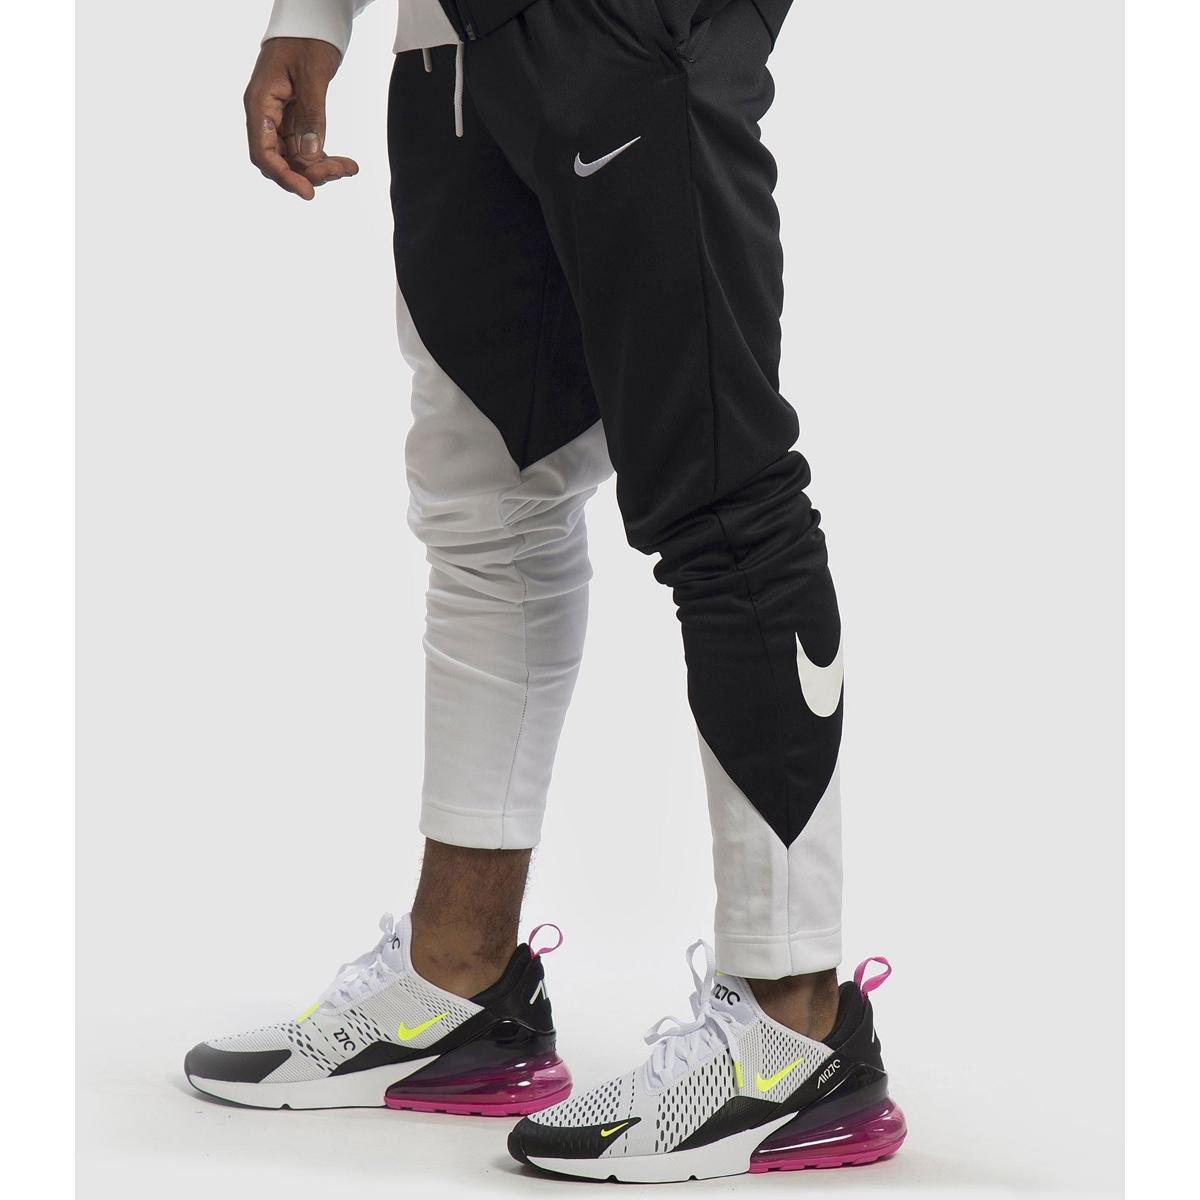 Pantaloni in tuta Nike Sportswear Swoosh da uomo rif. BV5289-010